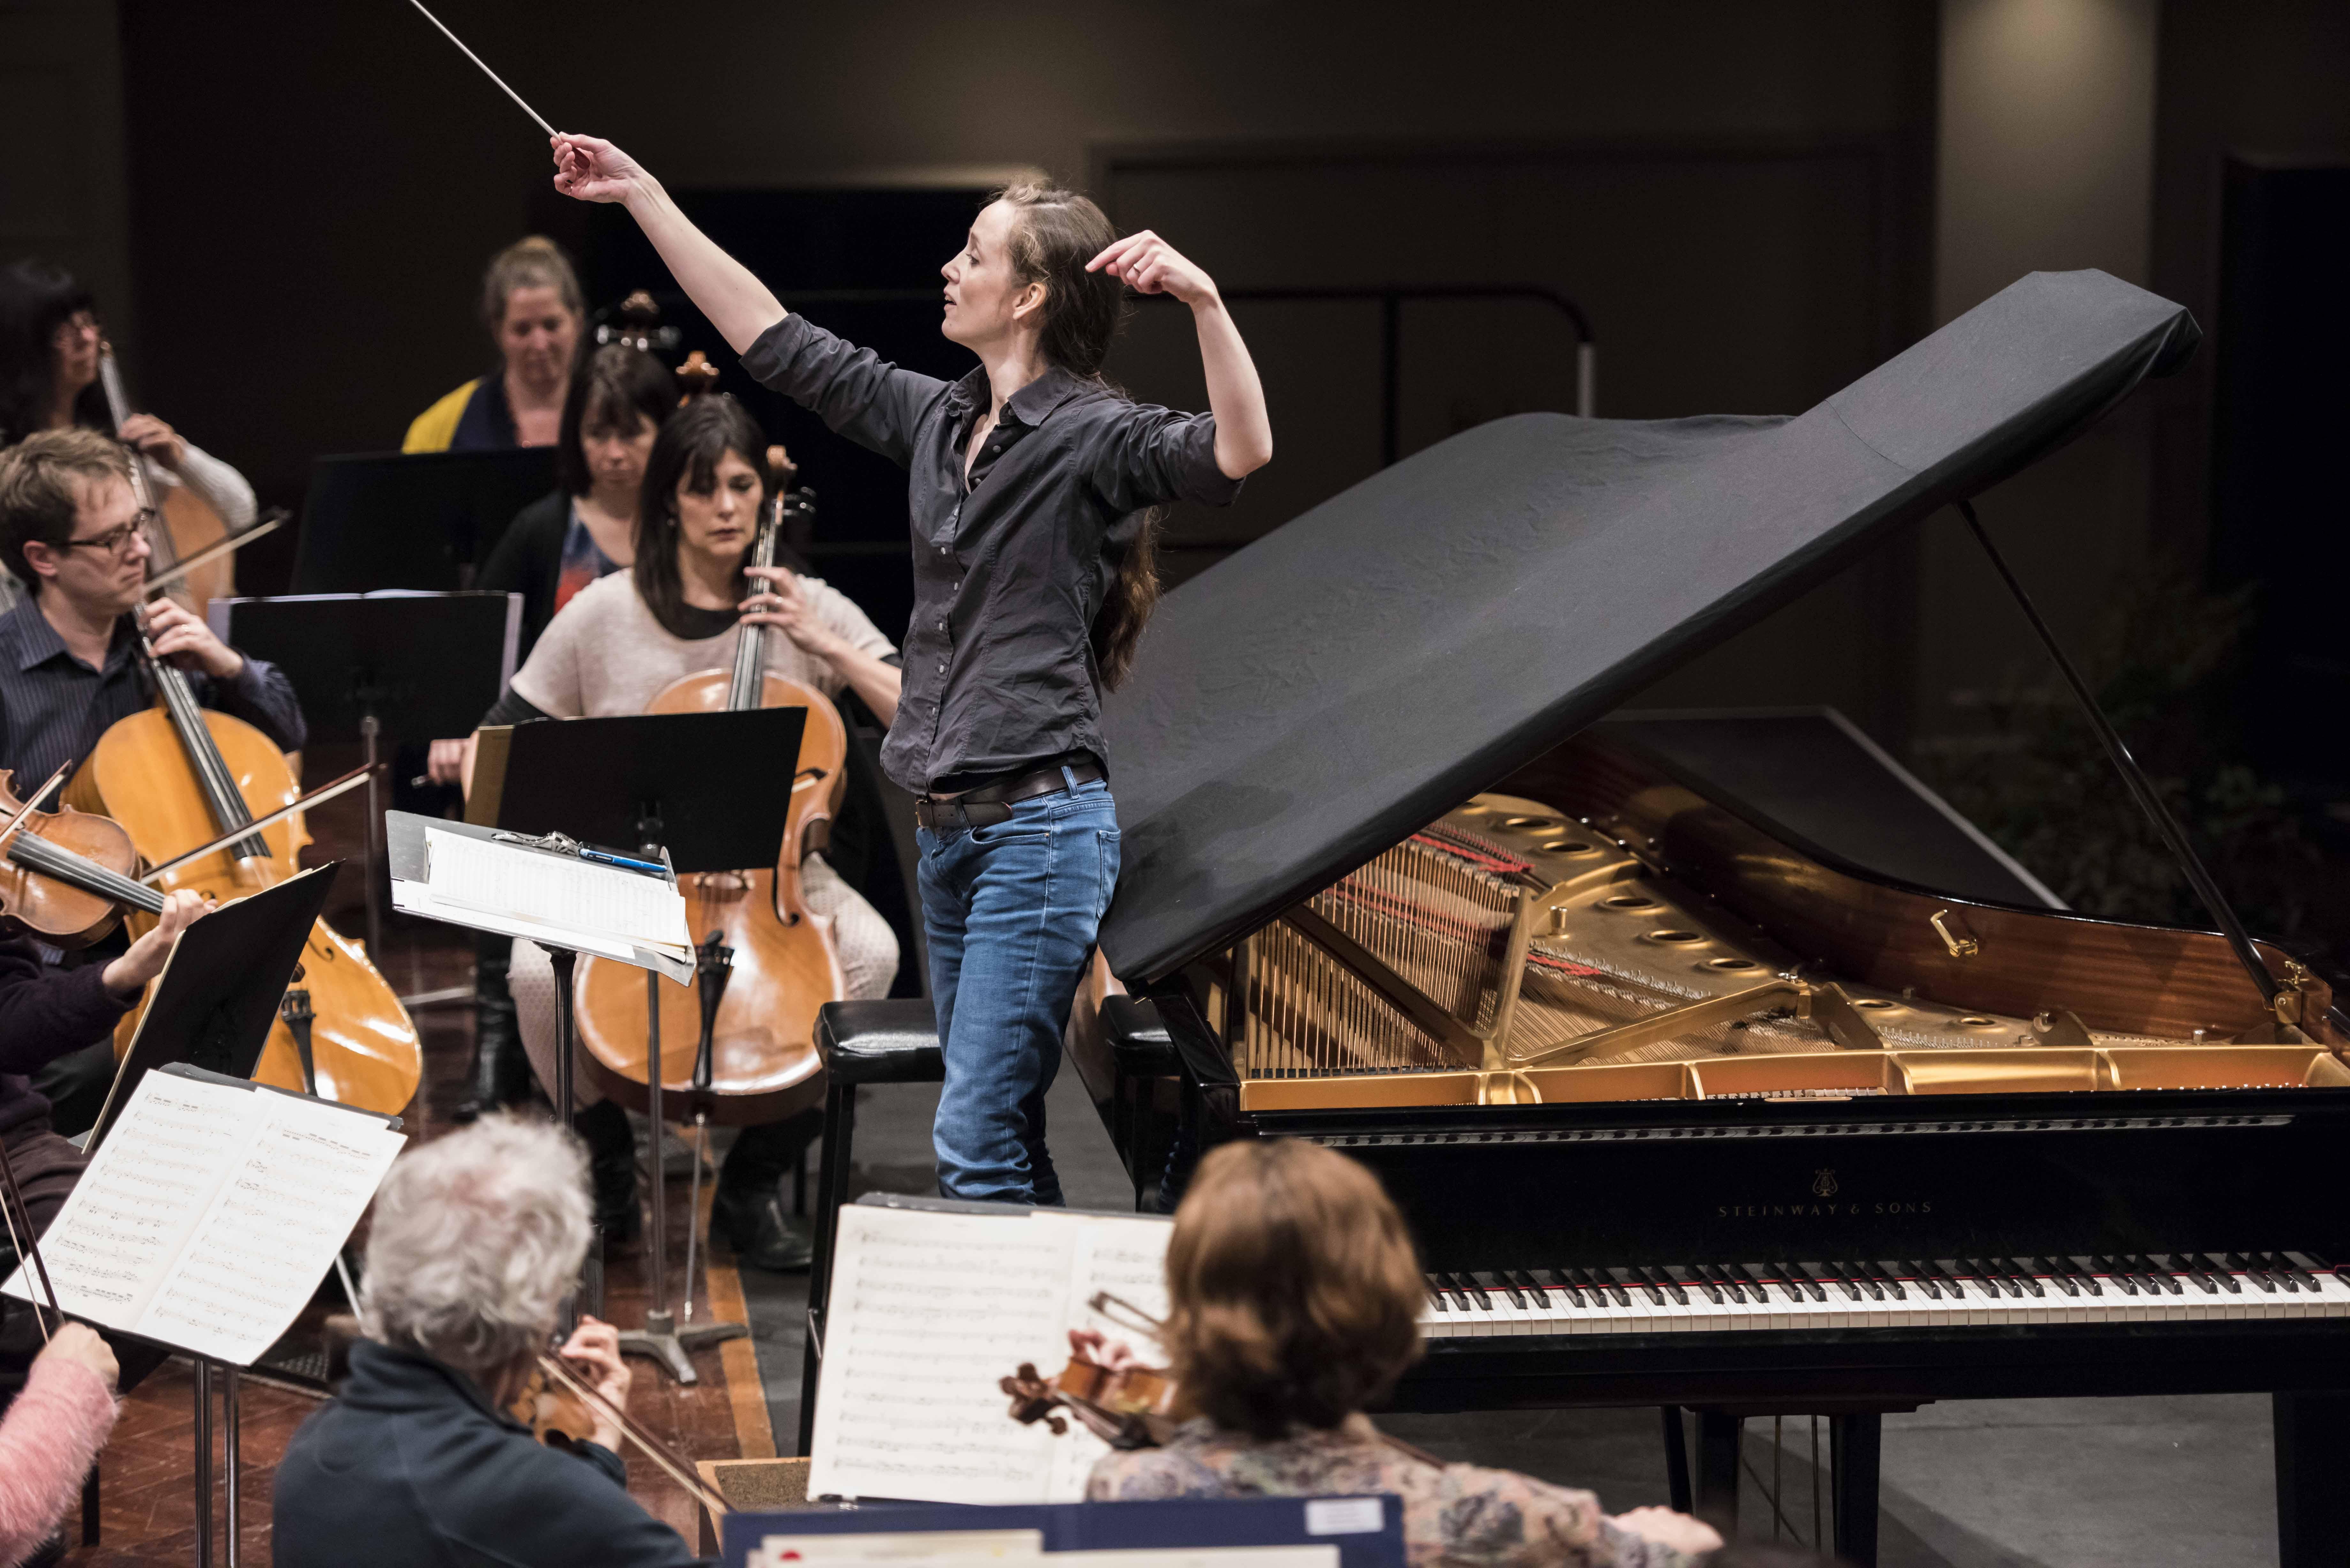 Conductor : Jessica Cottis